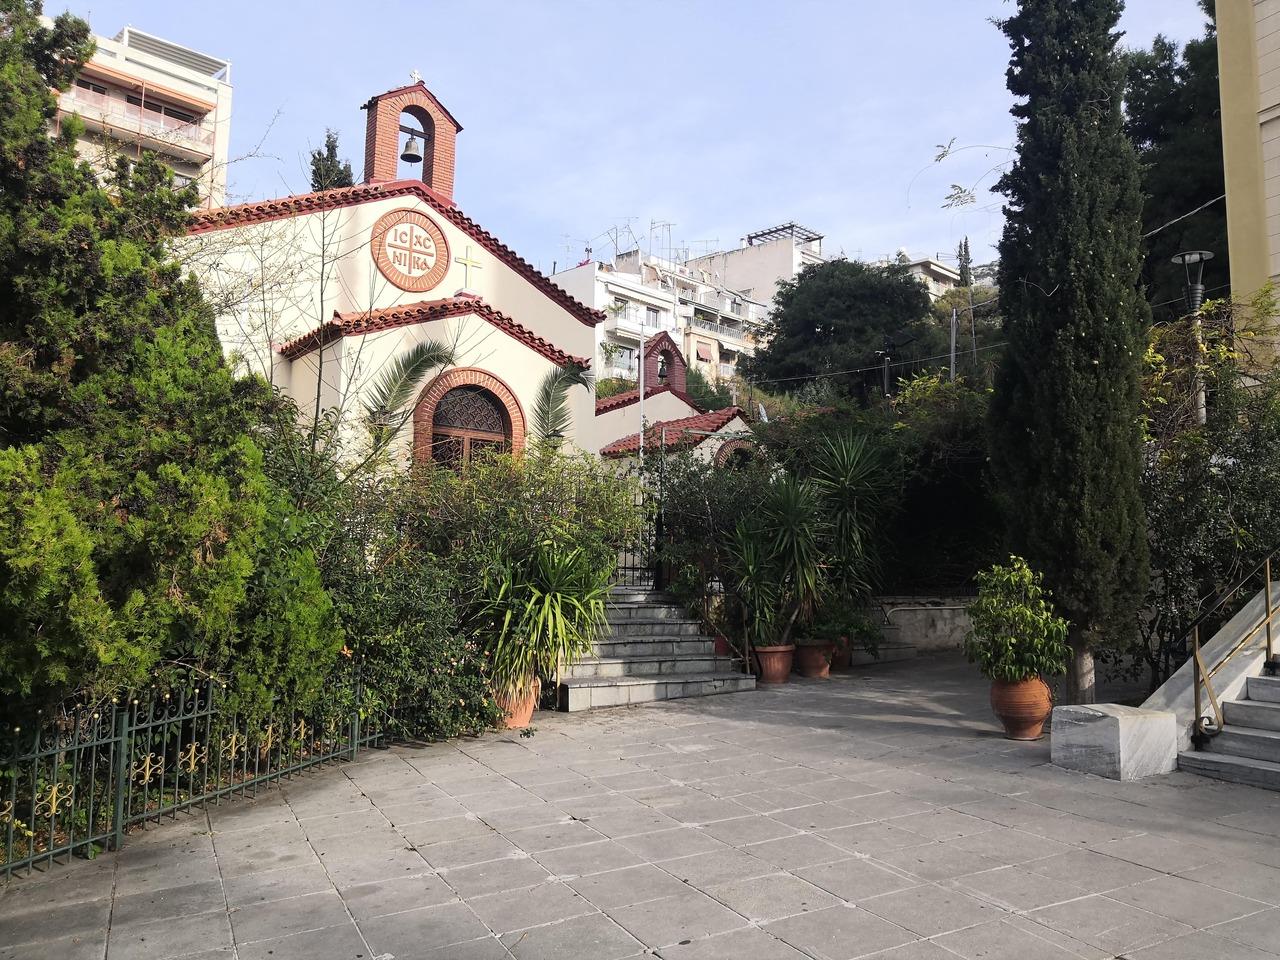 Urban churchyard adjacent to a park